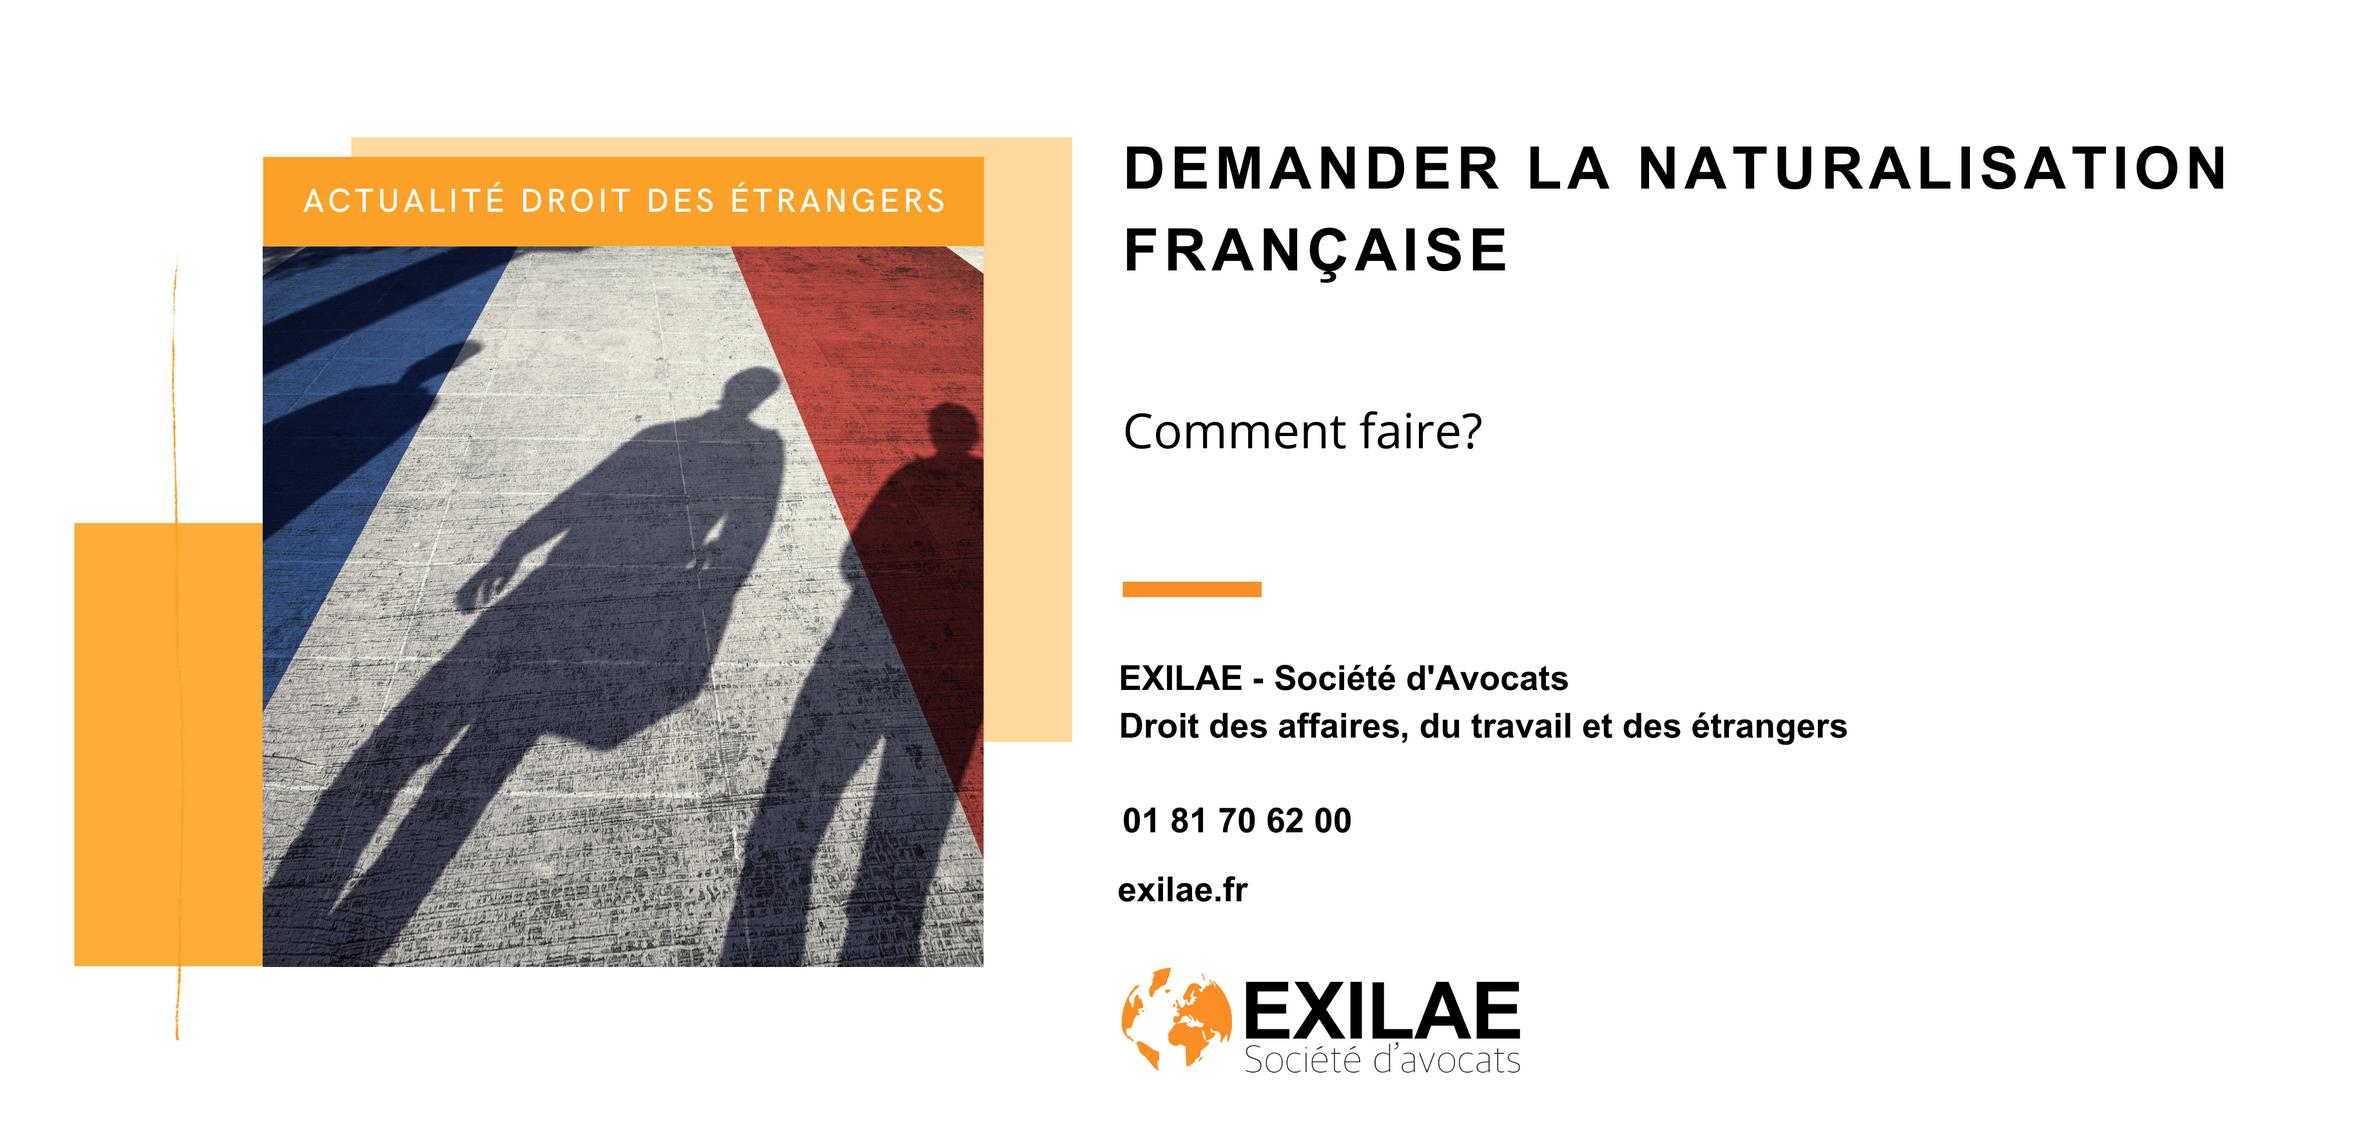 Demander la naturalisation française